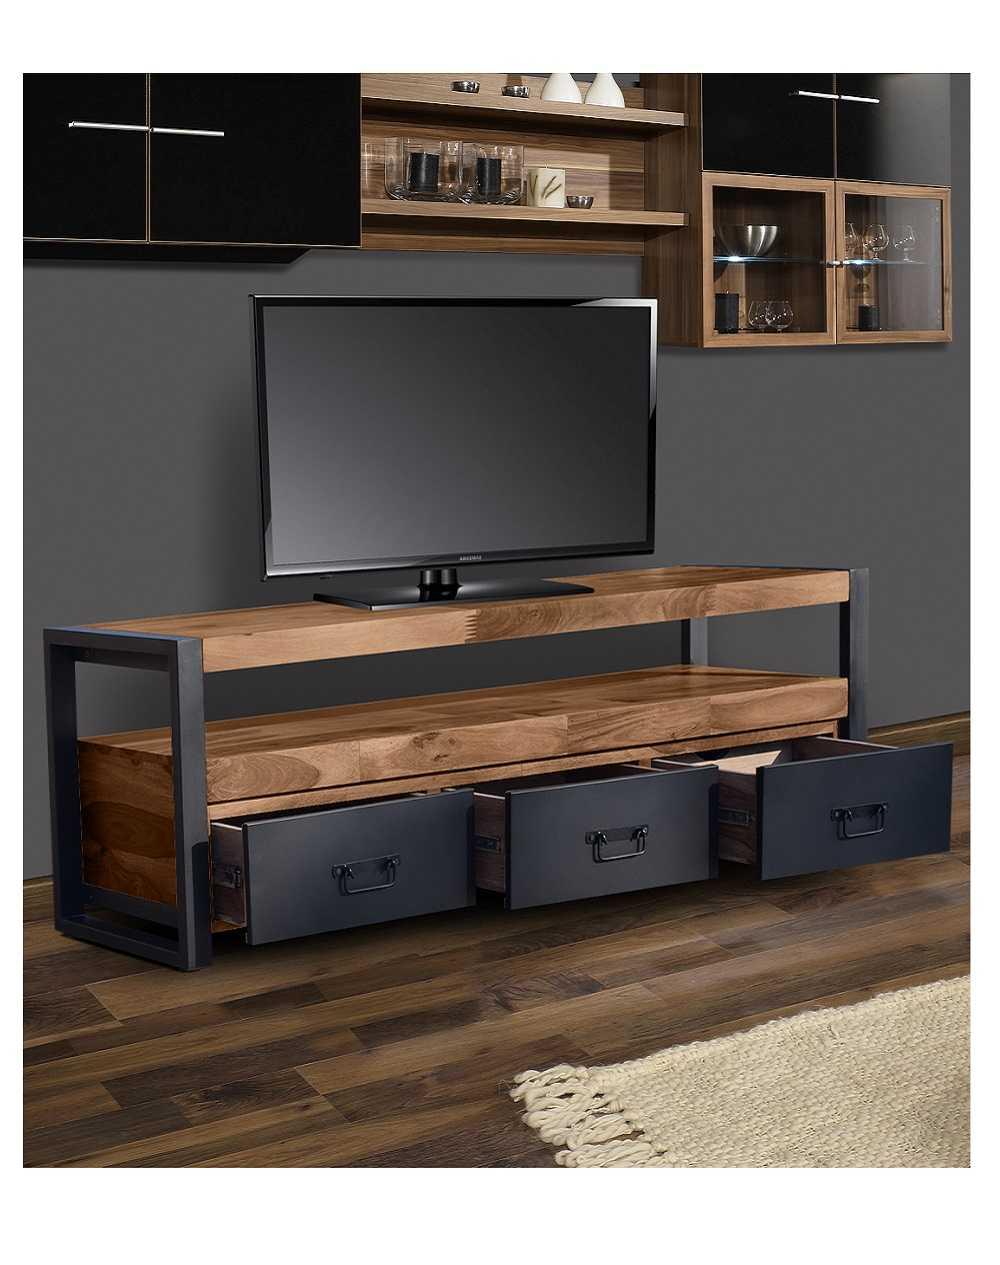 OBUZI - Kvalitetsmøbler i unikt design